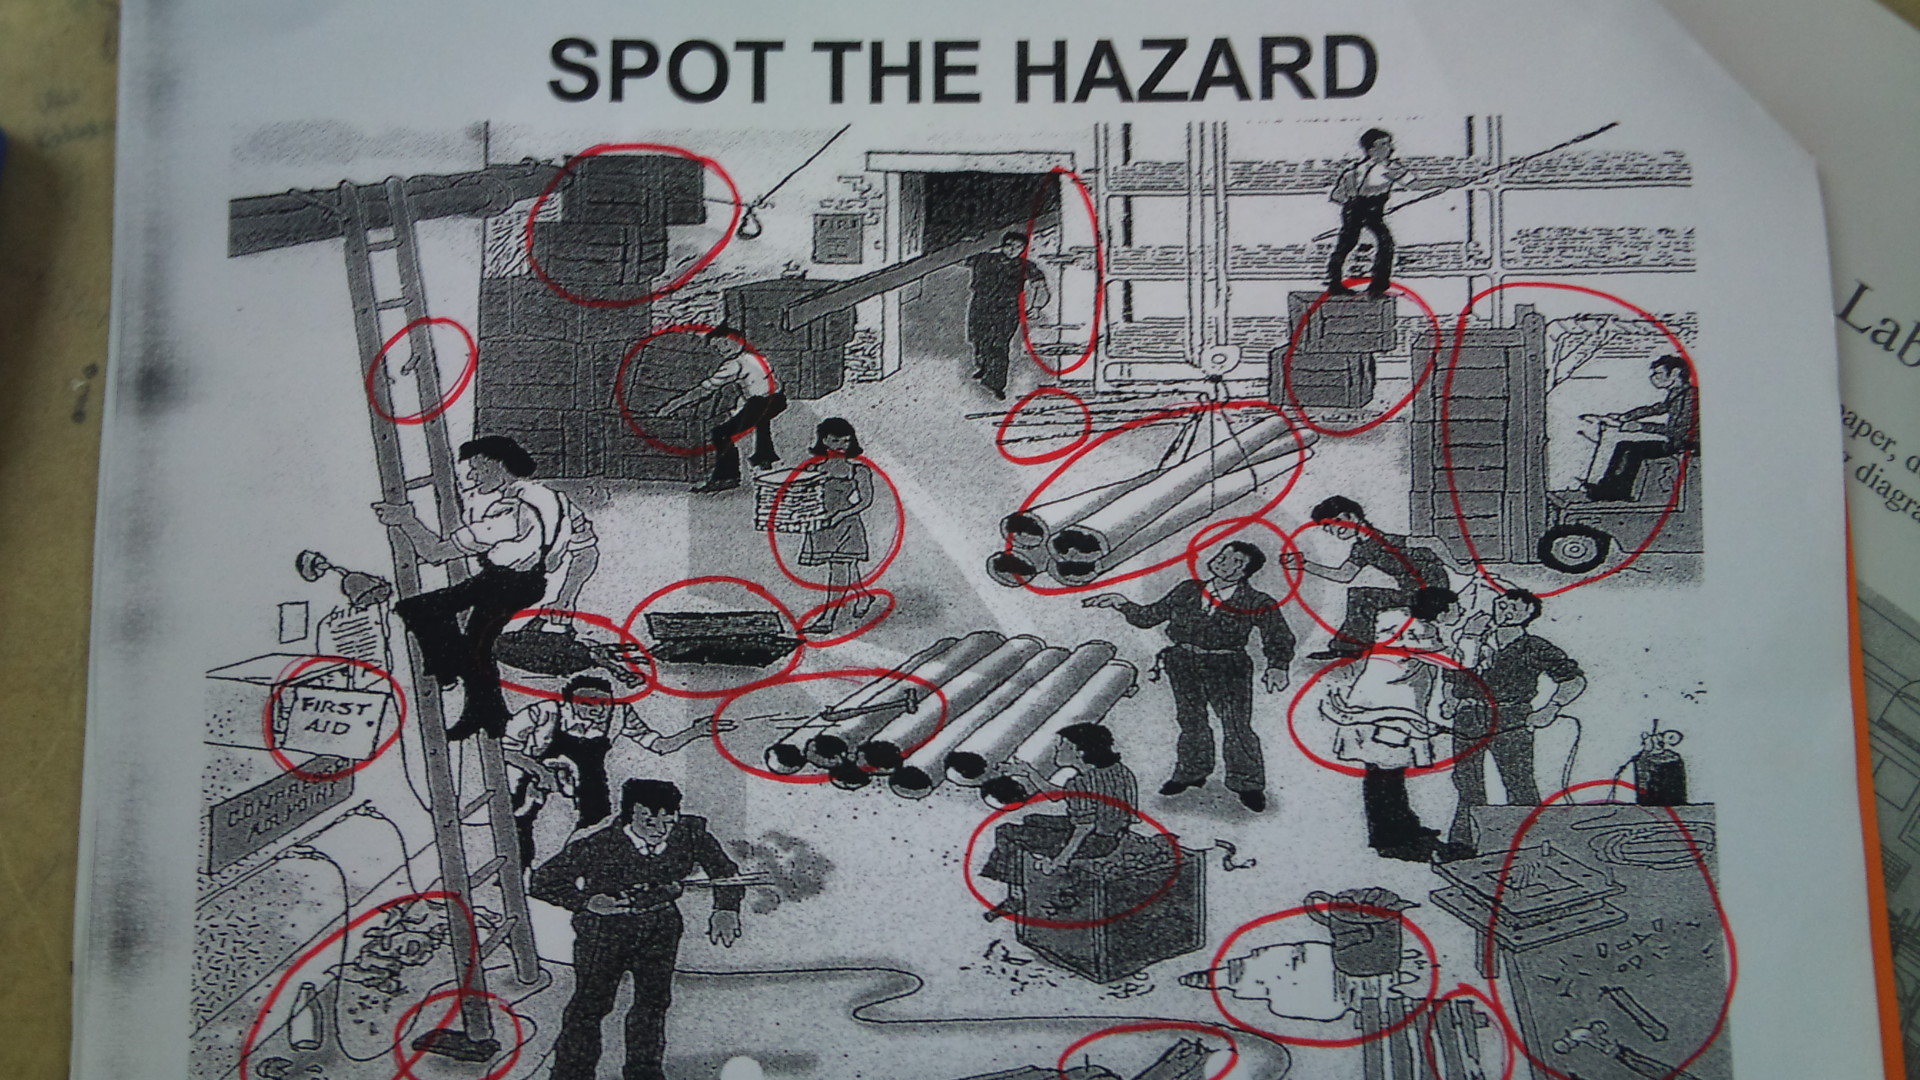 Sheet Hazard Activity Spot